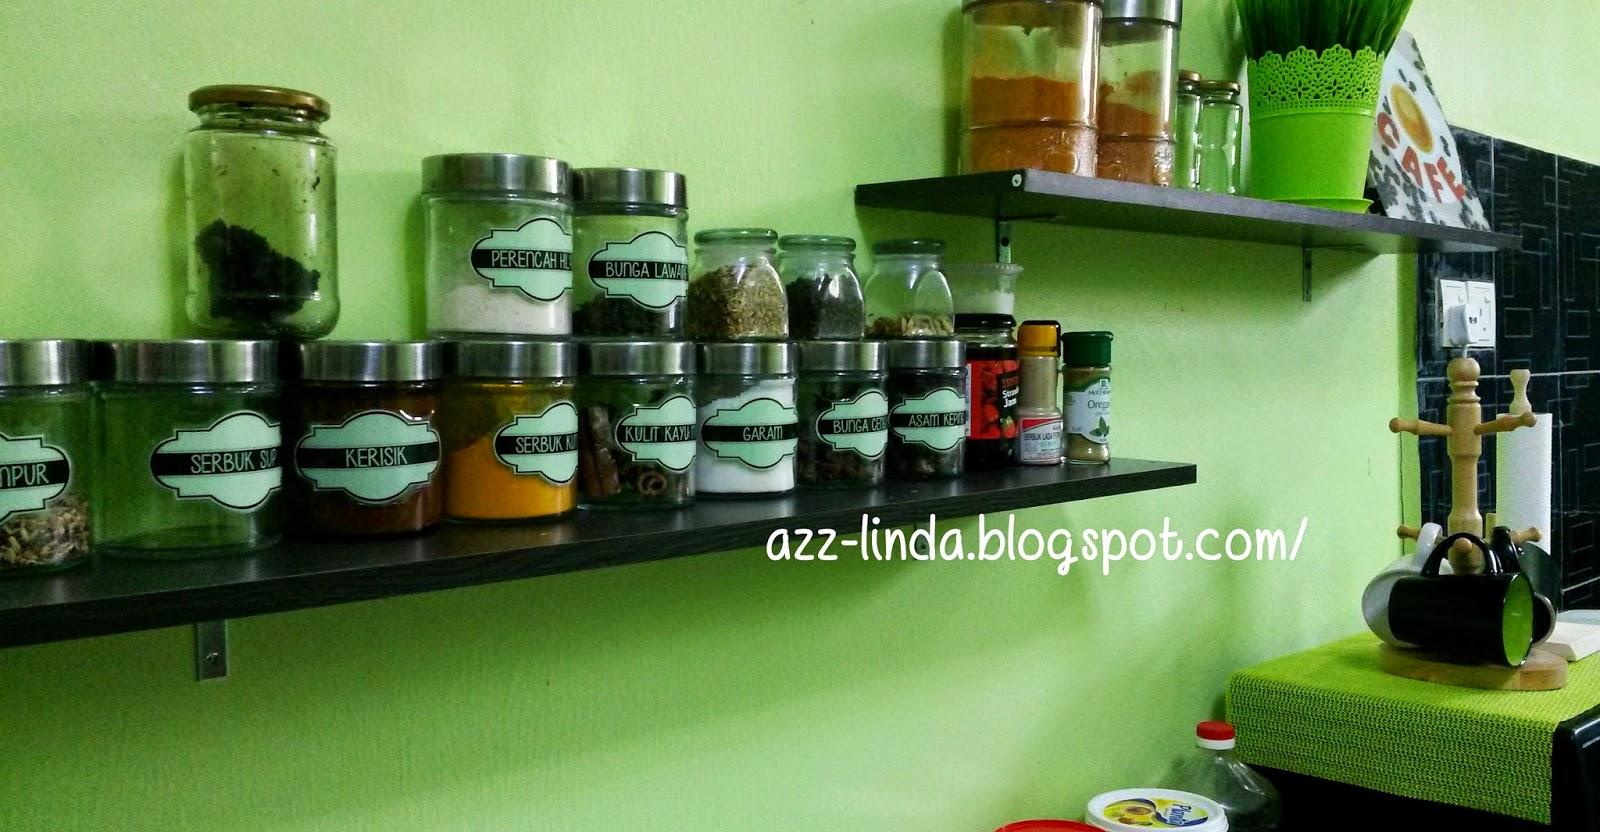 Ni Ruang Dapur Rumah Saya Sapa Yang Pernah Baca Blog Mesti Dah Penah Tengok Hijau Nih Kan Hehehe Kali Tambah Rak Untuk Letak Botol